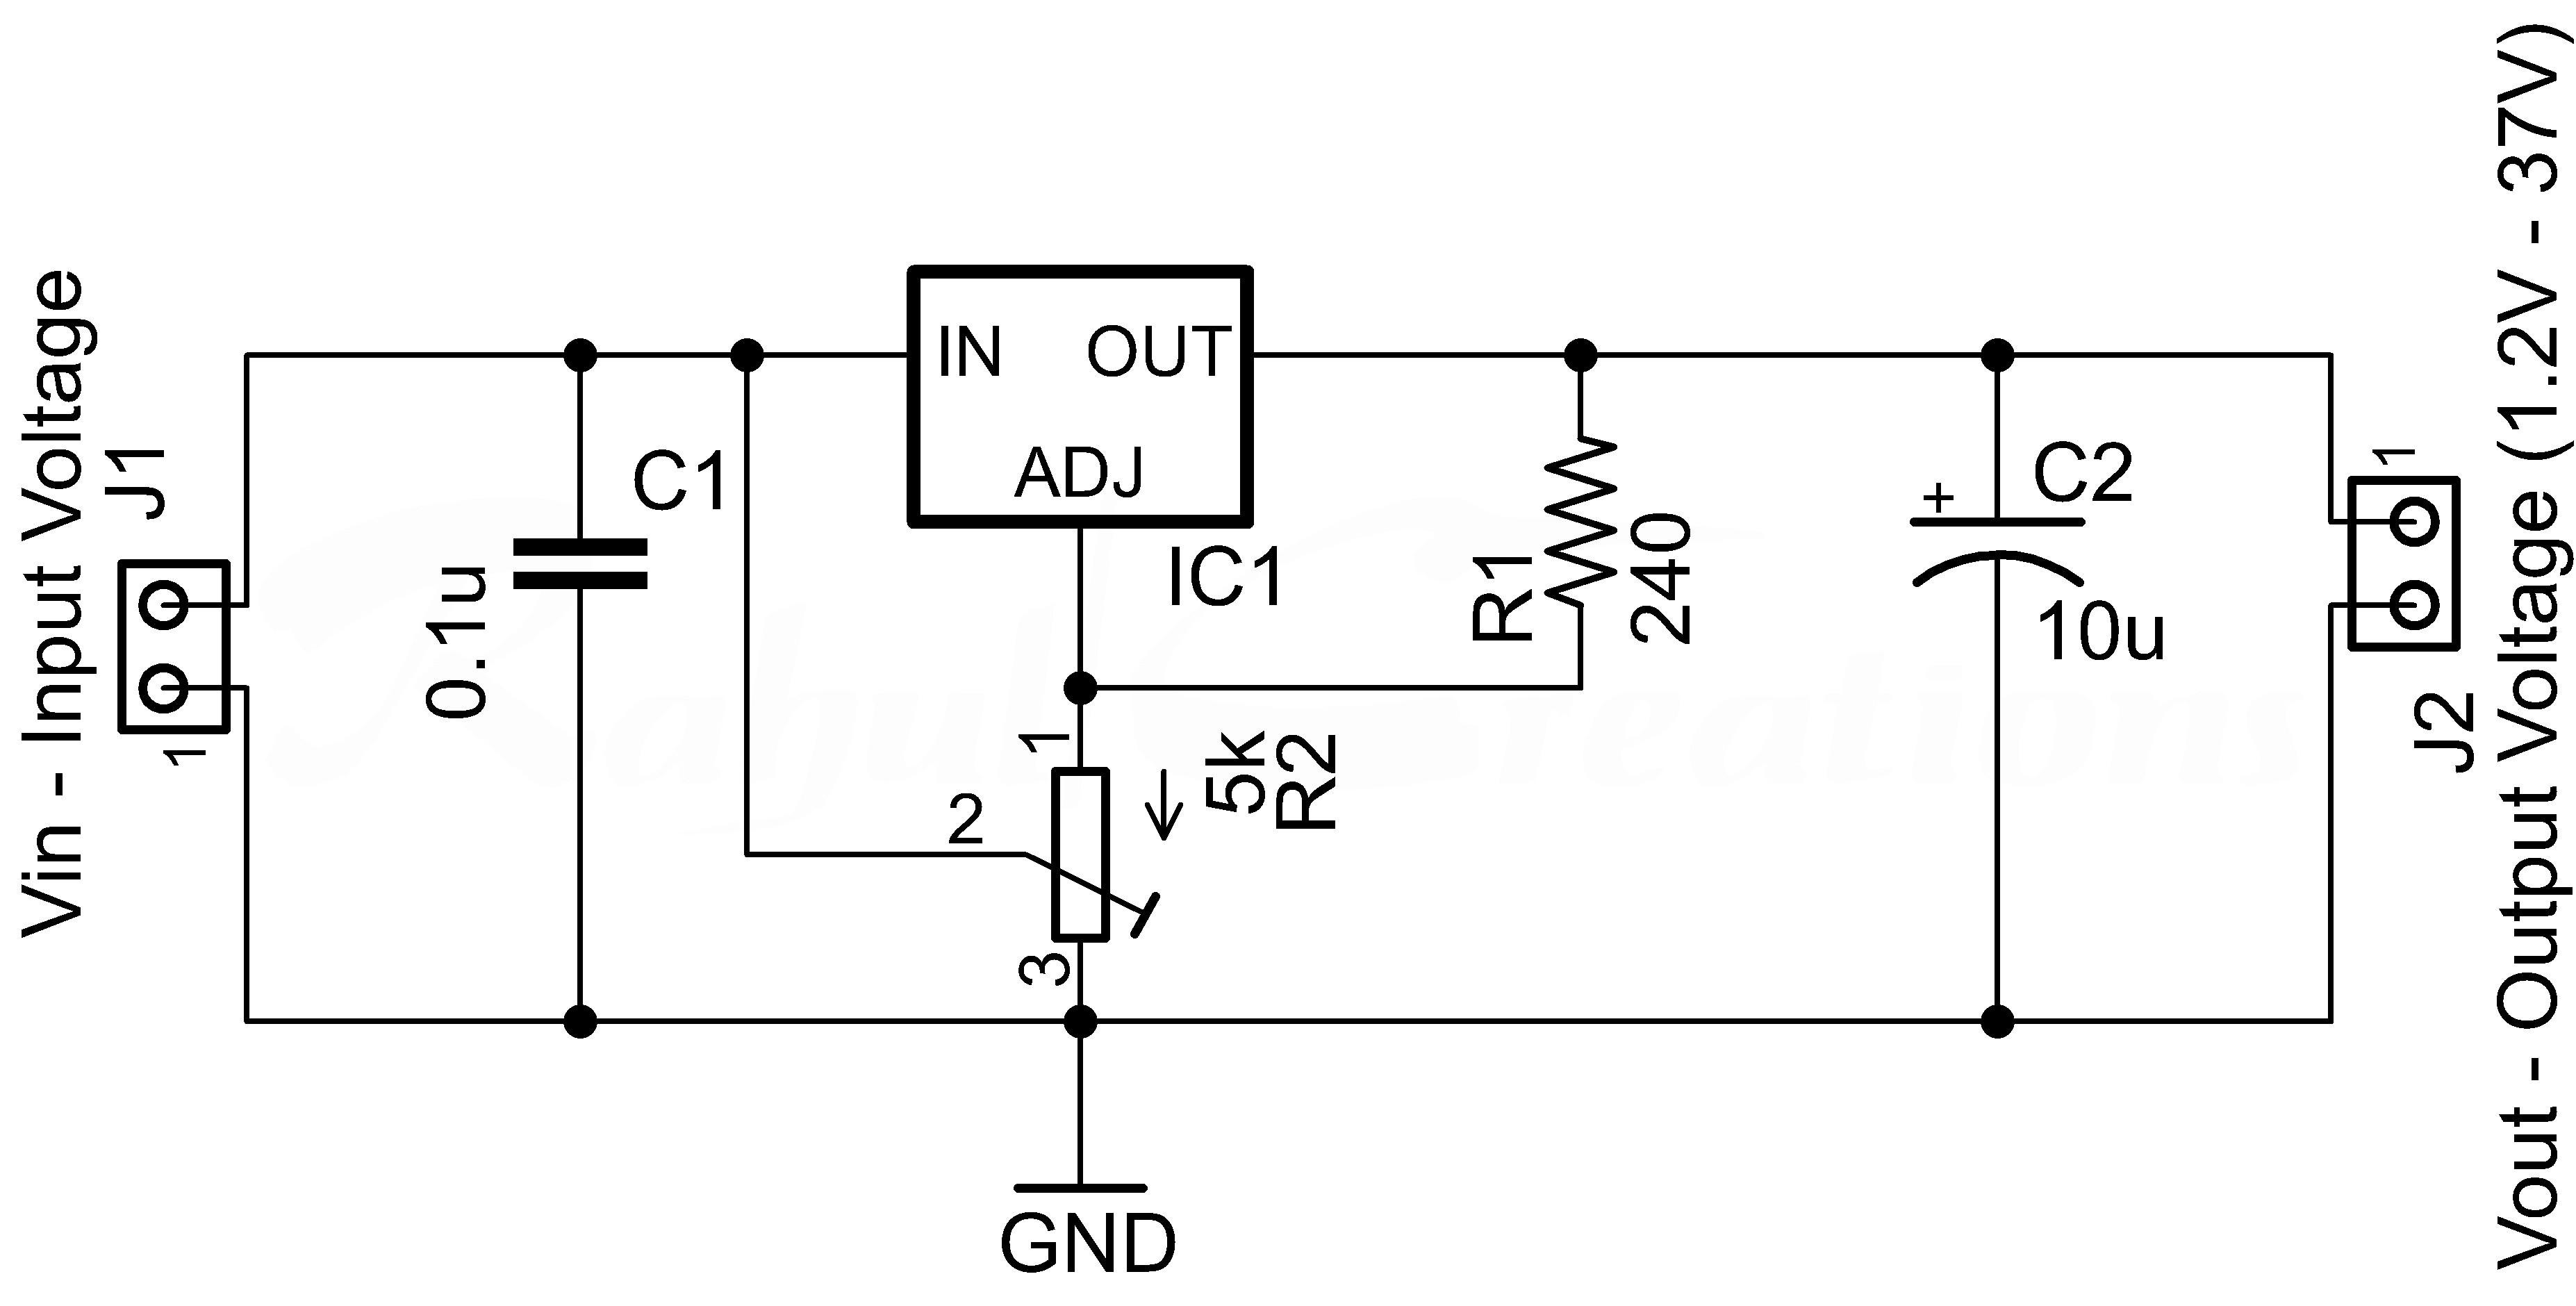 Led Chasing Circuit Wiring Diagram Image Chaser Inspirational Wonderful Efy Circuits Diagrams Electrical